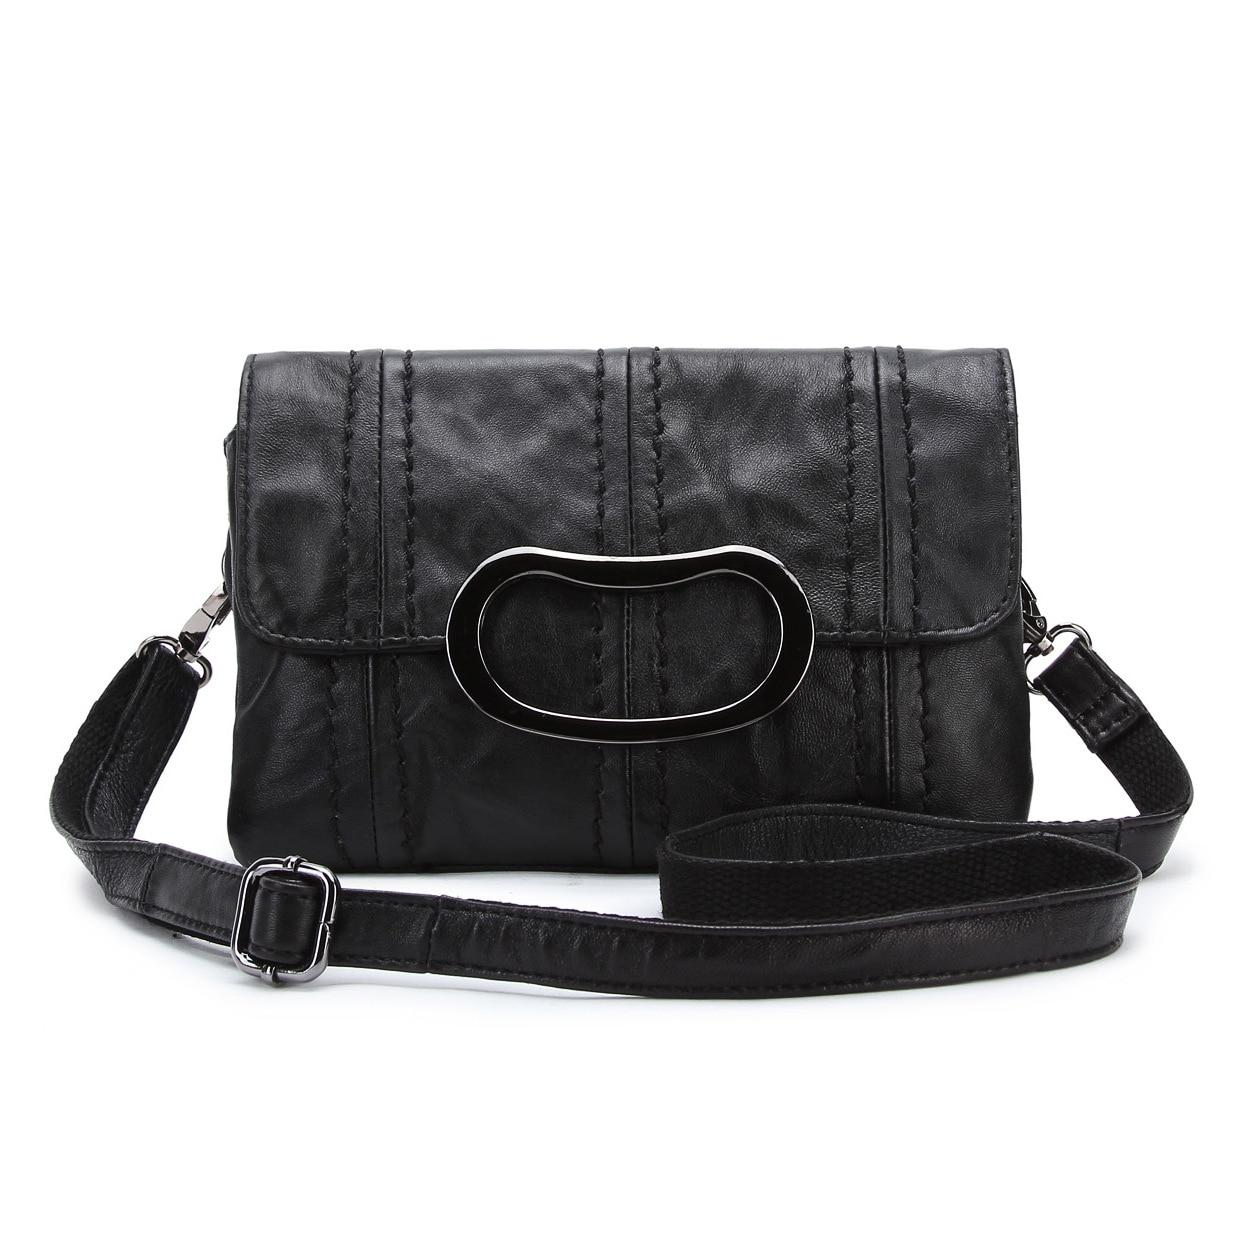 Fashion Genuine Women Bags Handbags Metal Handle Famous Brand Designer Envelope Bag Sheepskin Shoulder Bag Lady Crossbody Bags<br><br>Aliexpress